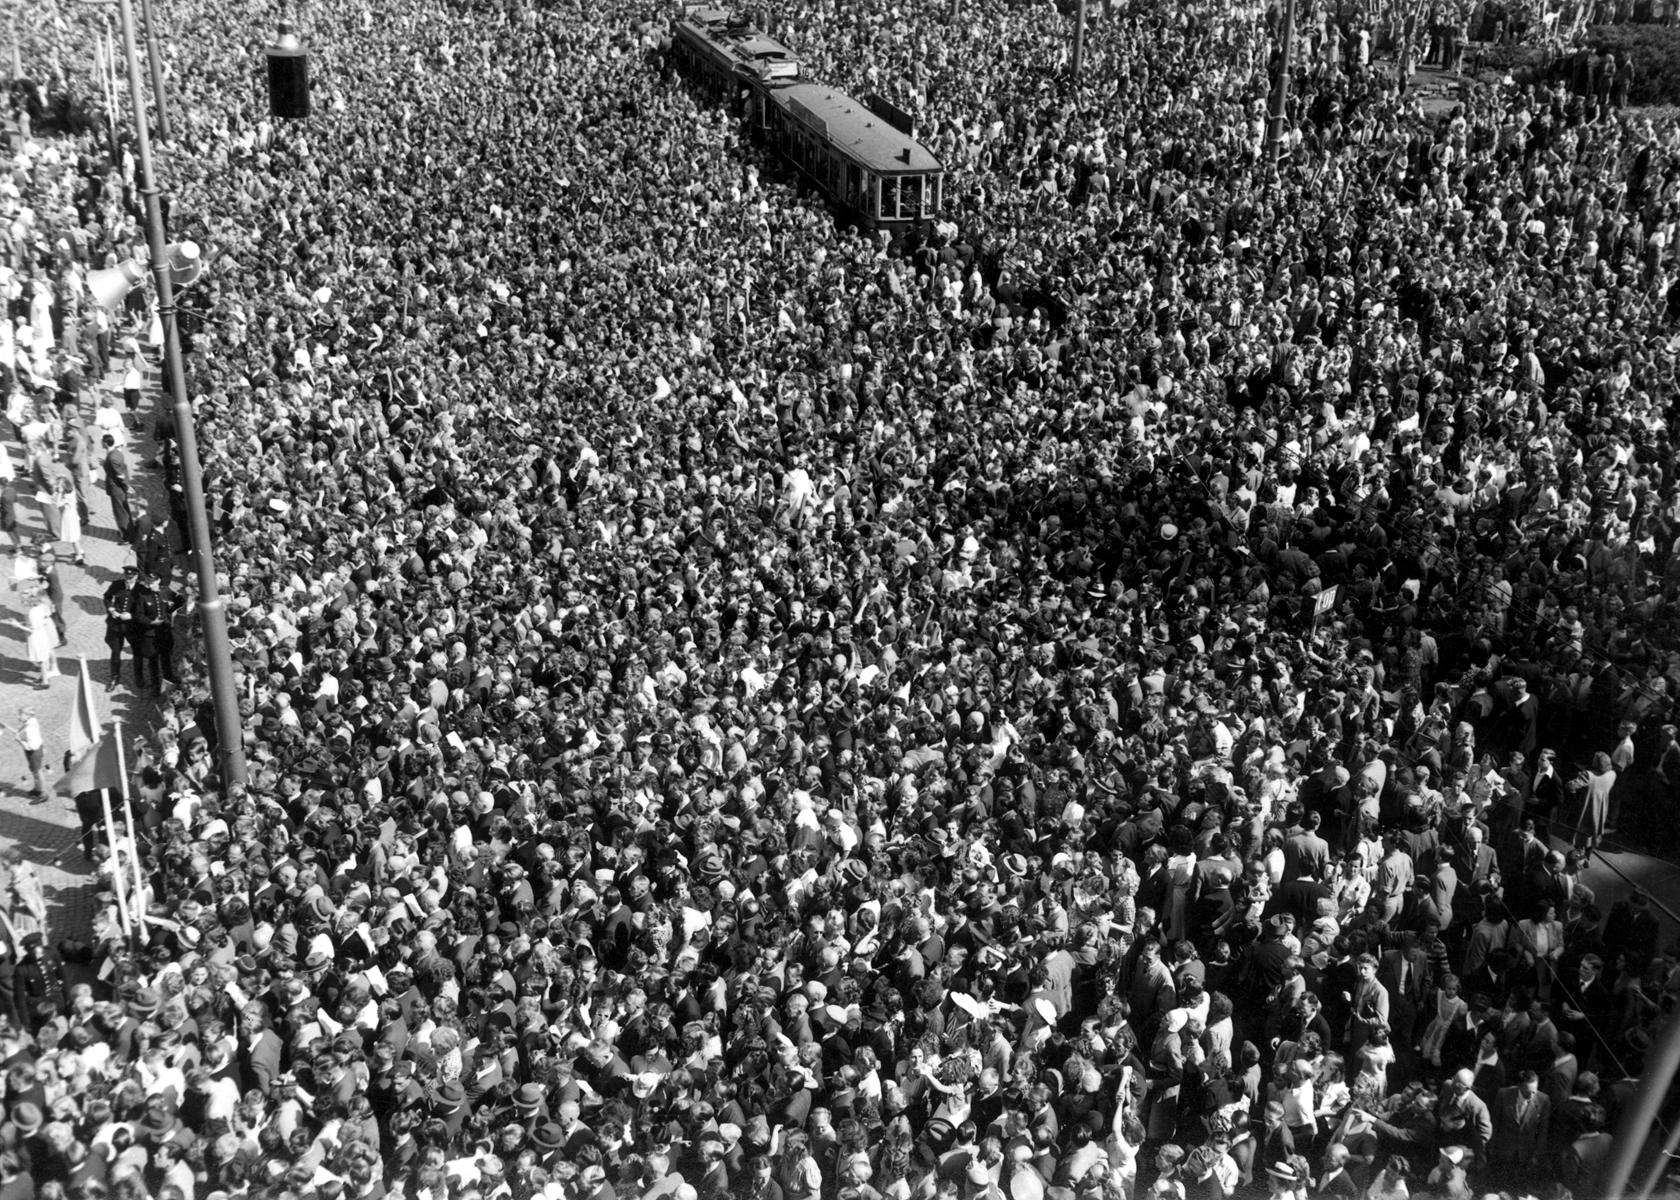 Aubade voor wilhelmina t g v haar 50 jarig regeringsjubileum dam te amsterdam 31 08 1948 - Ruimte aubade ...